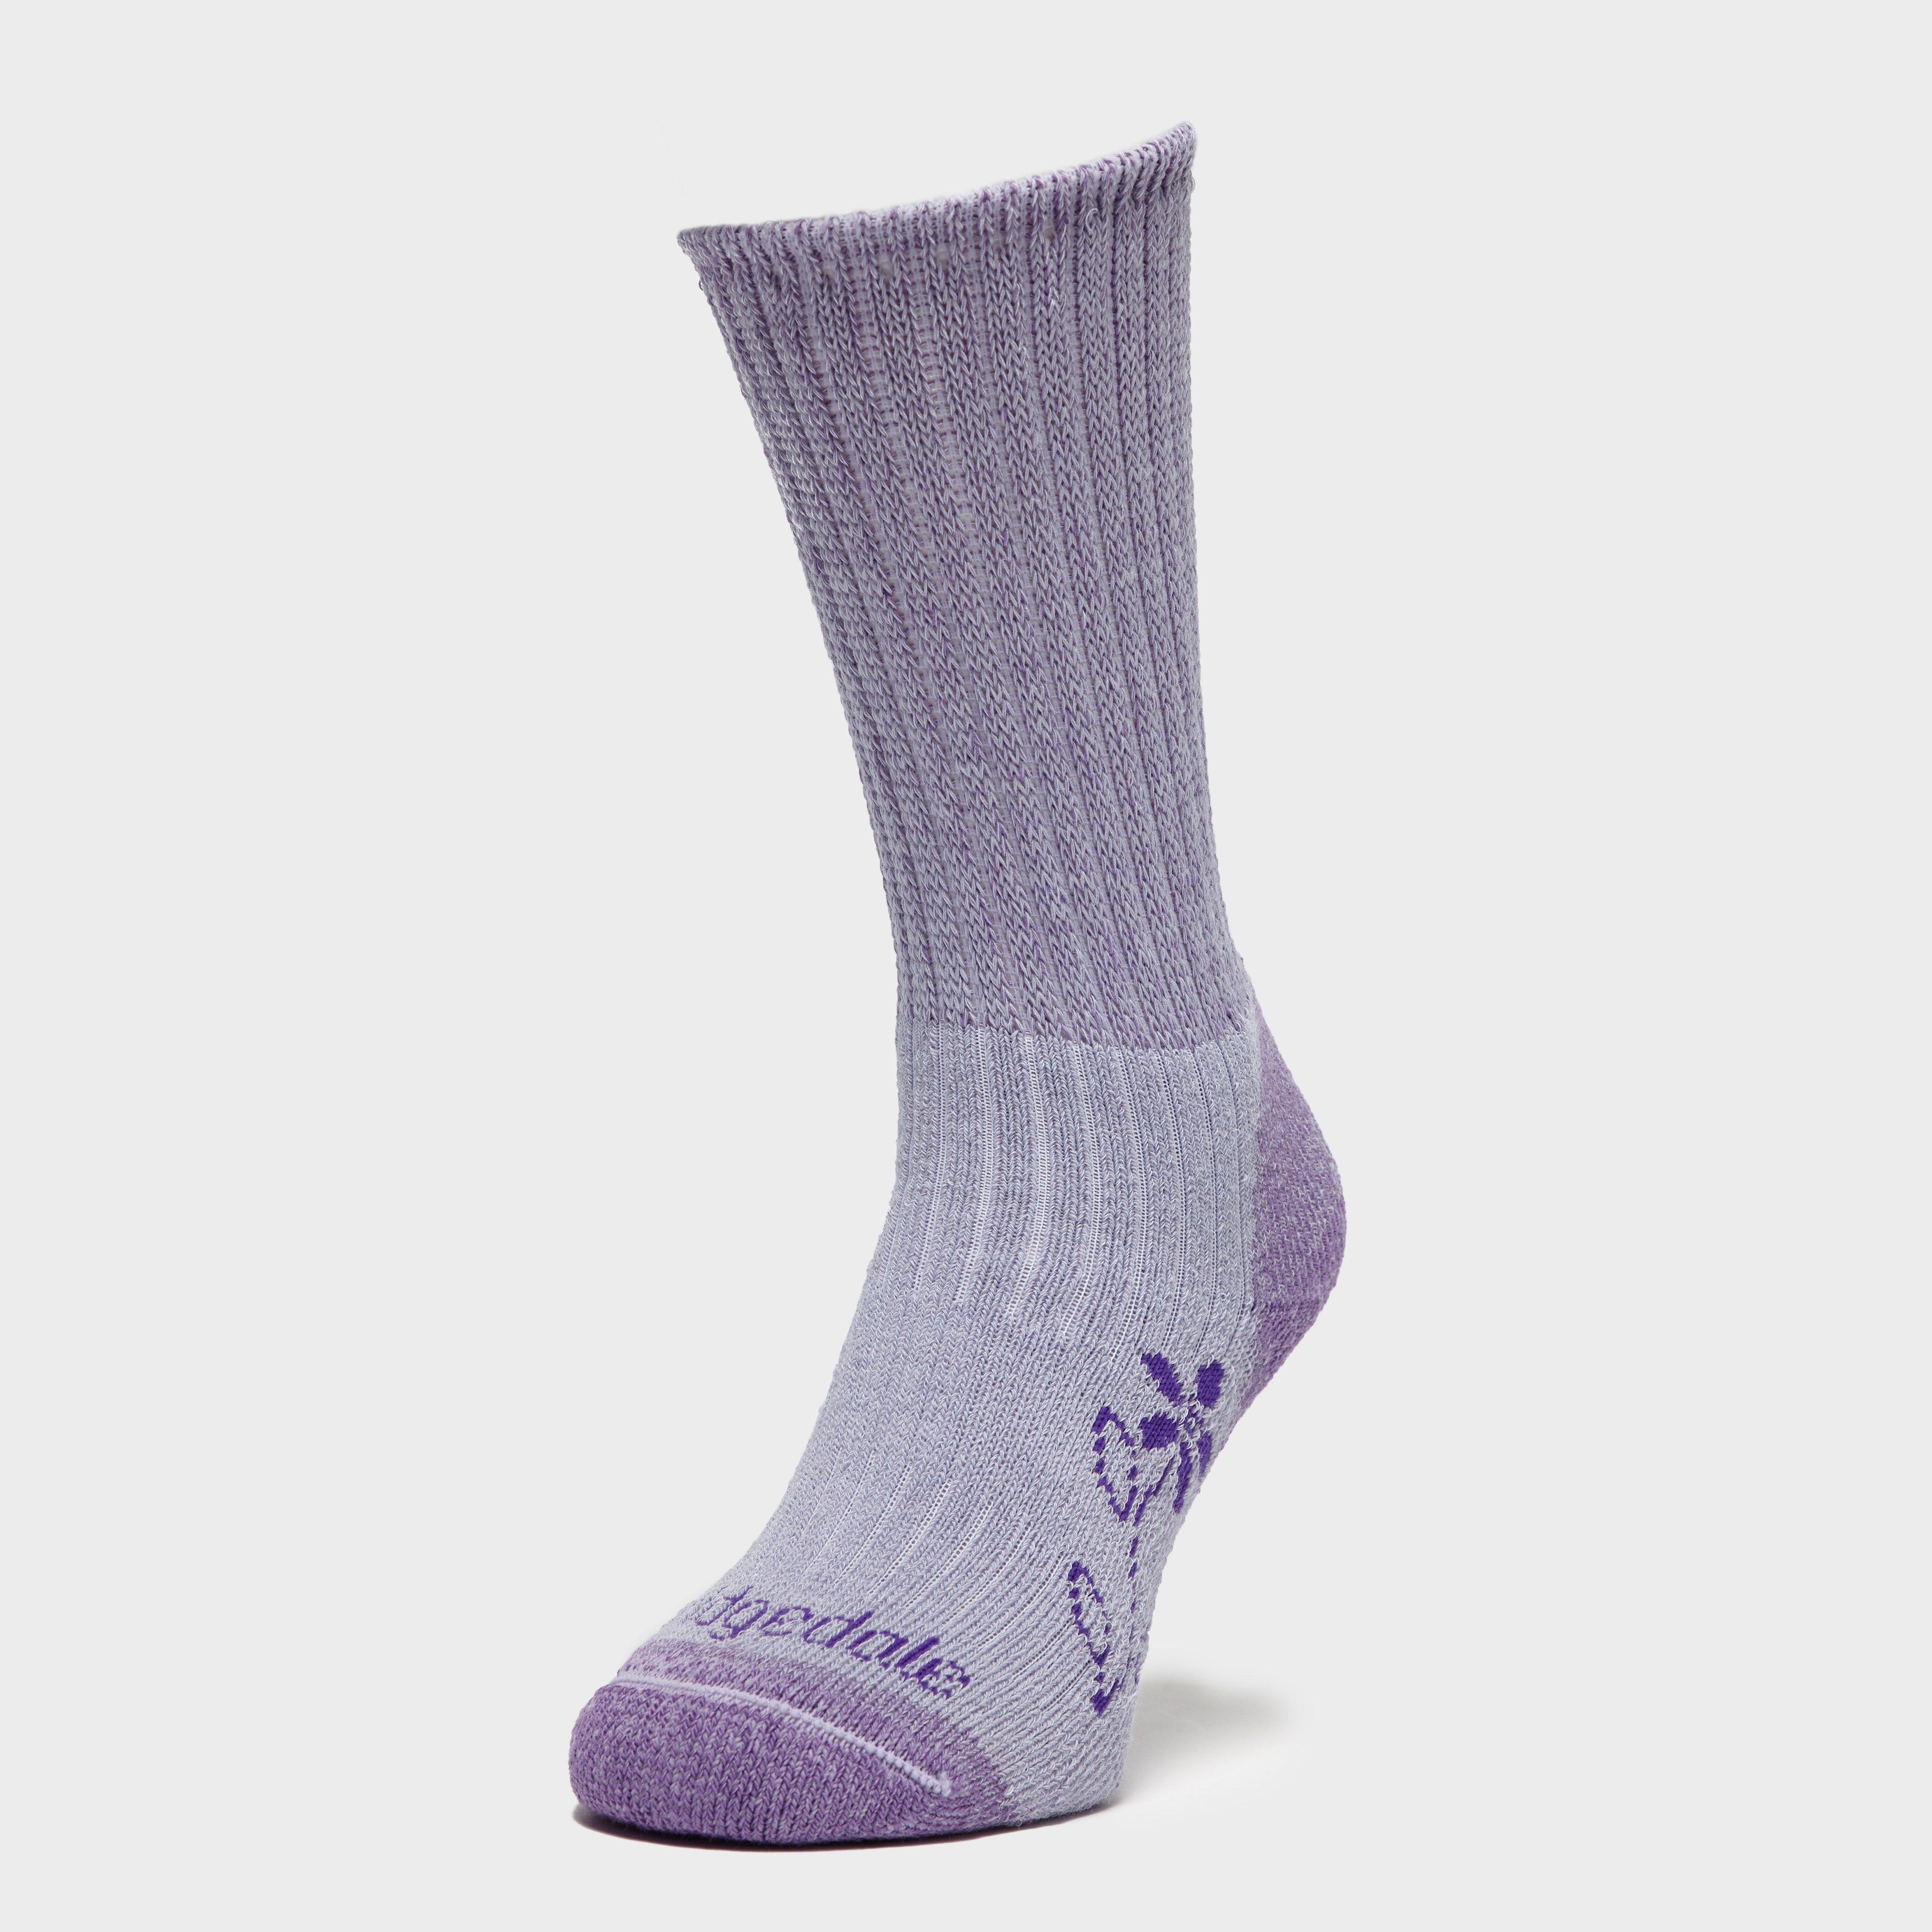 Bridgedale Women's Hike Midweight Comfort Socks, Purple